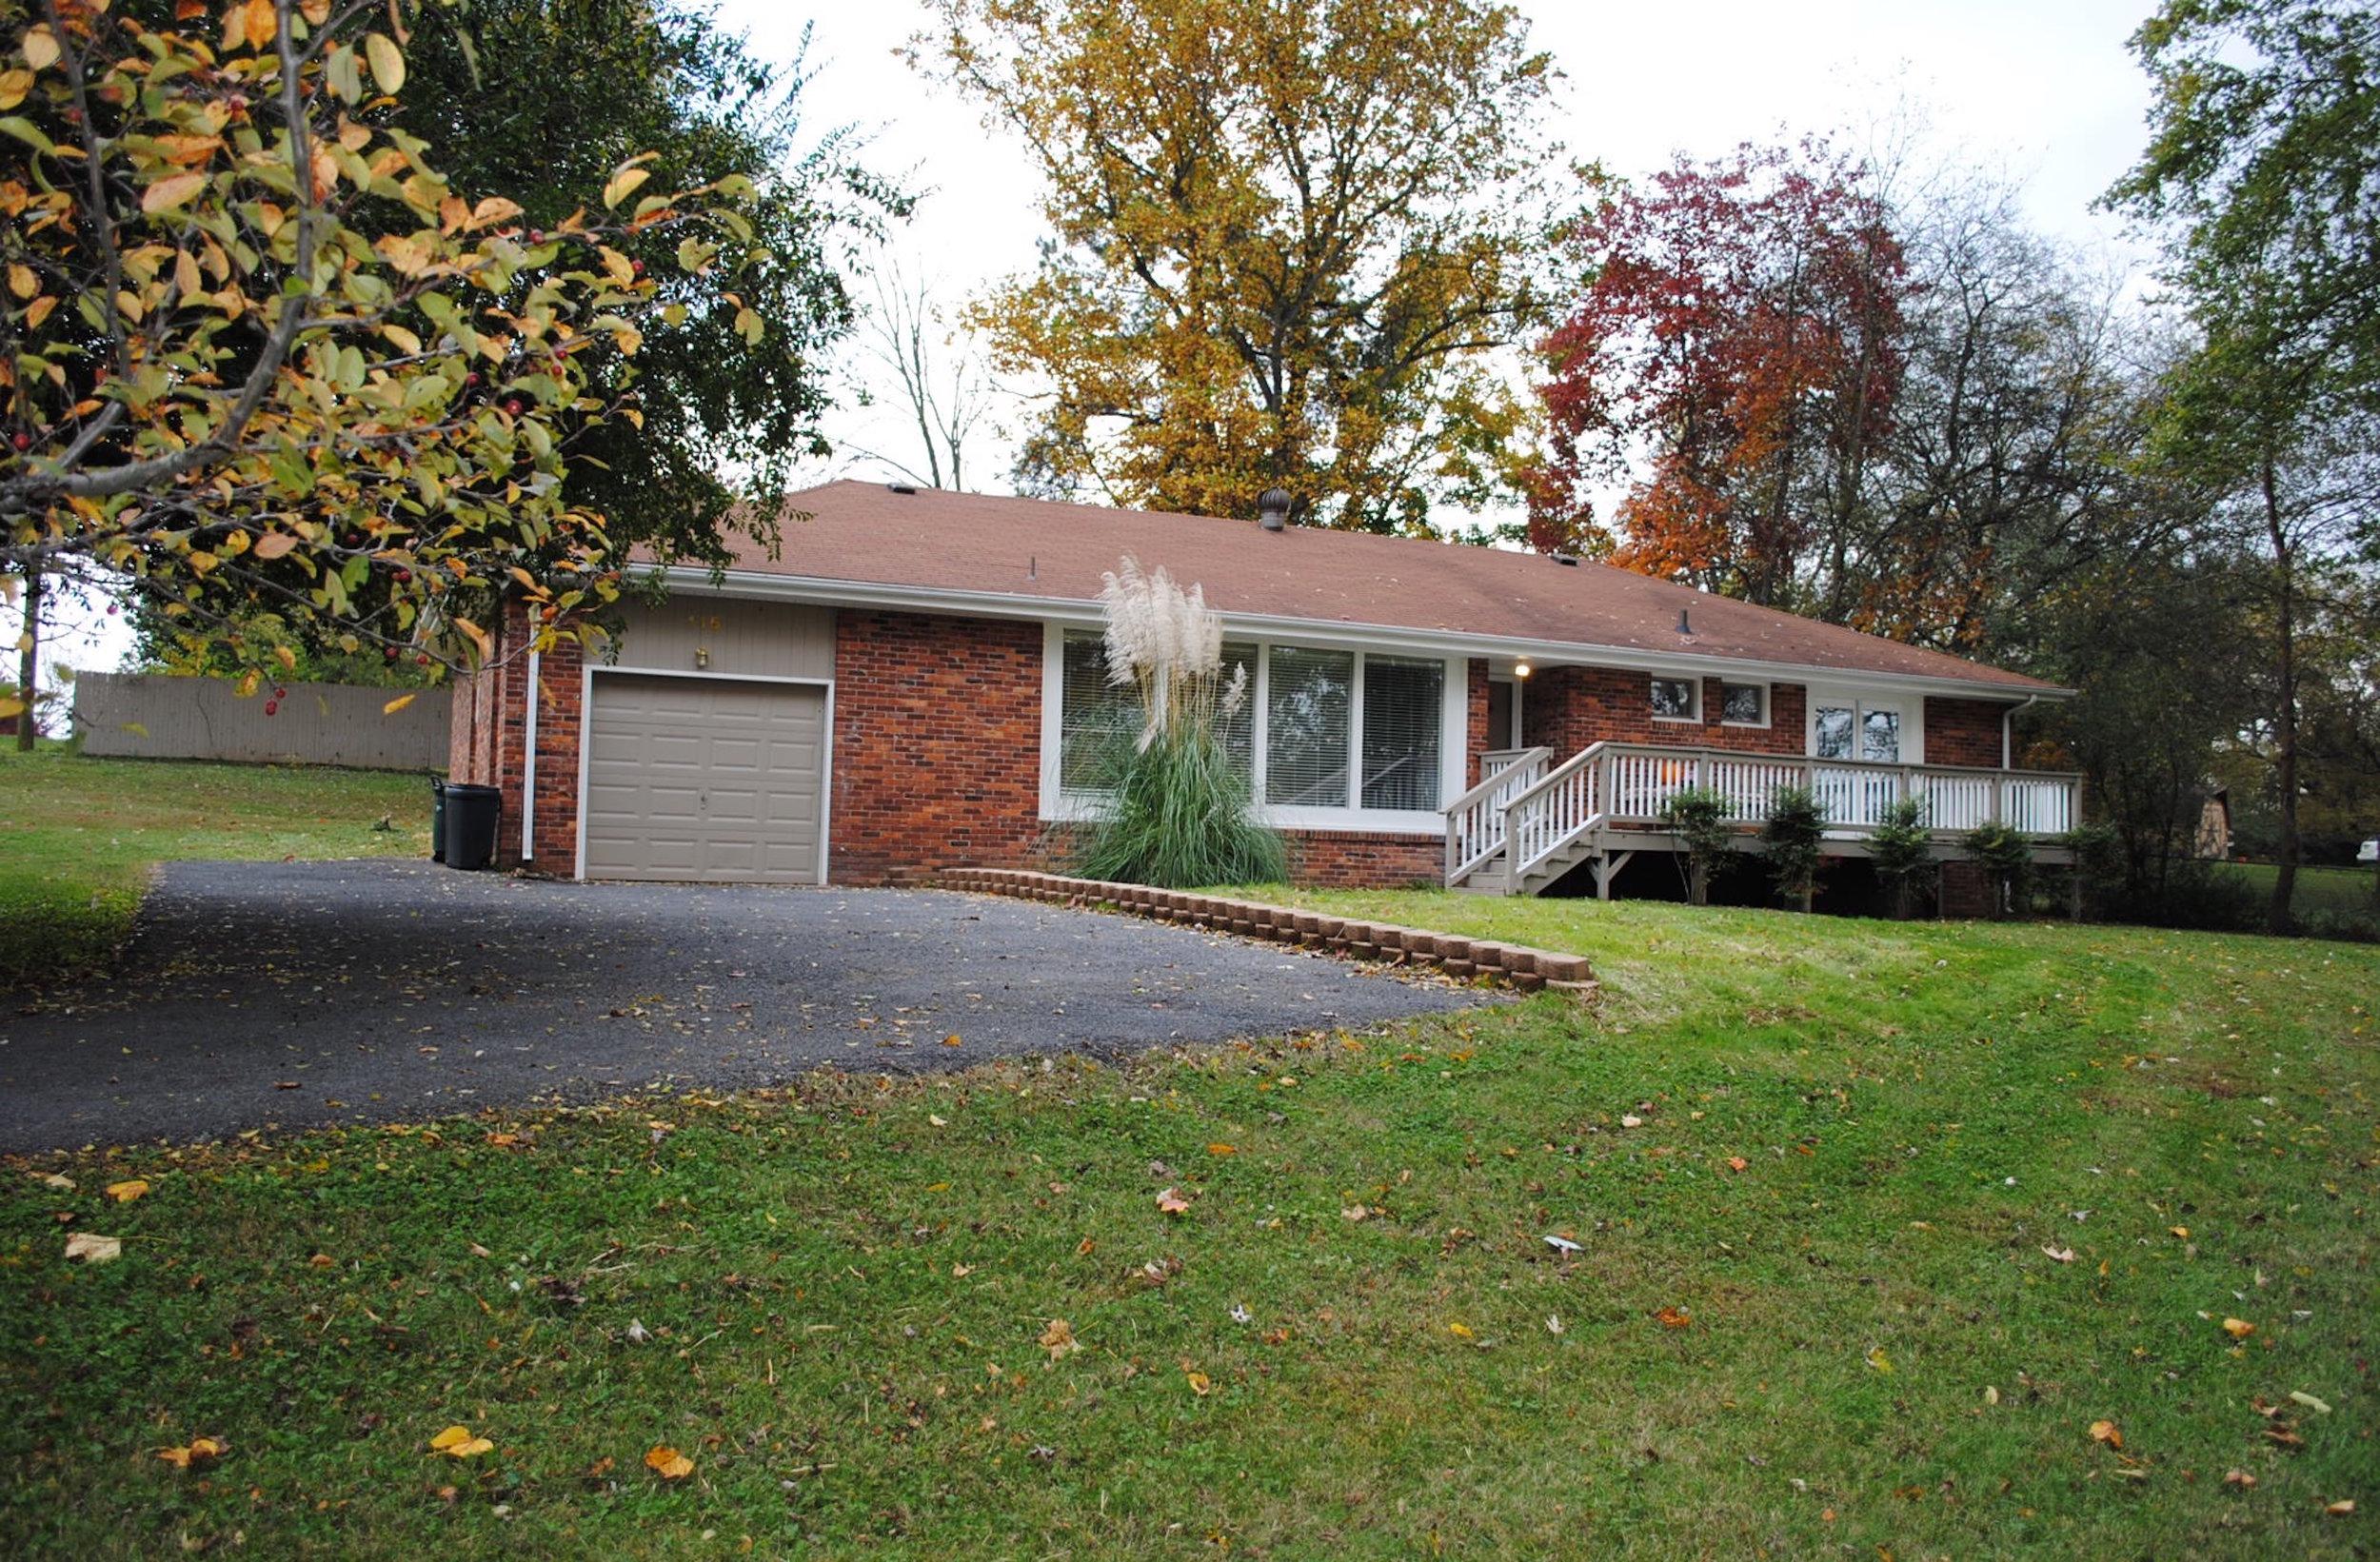 115 Circle Dr RENTED   HENDERSONVILLE:   Single Family Home  3 Br, 2 Ba + Garage + Fireplace +2 Decks